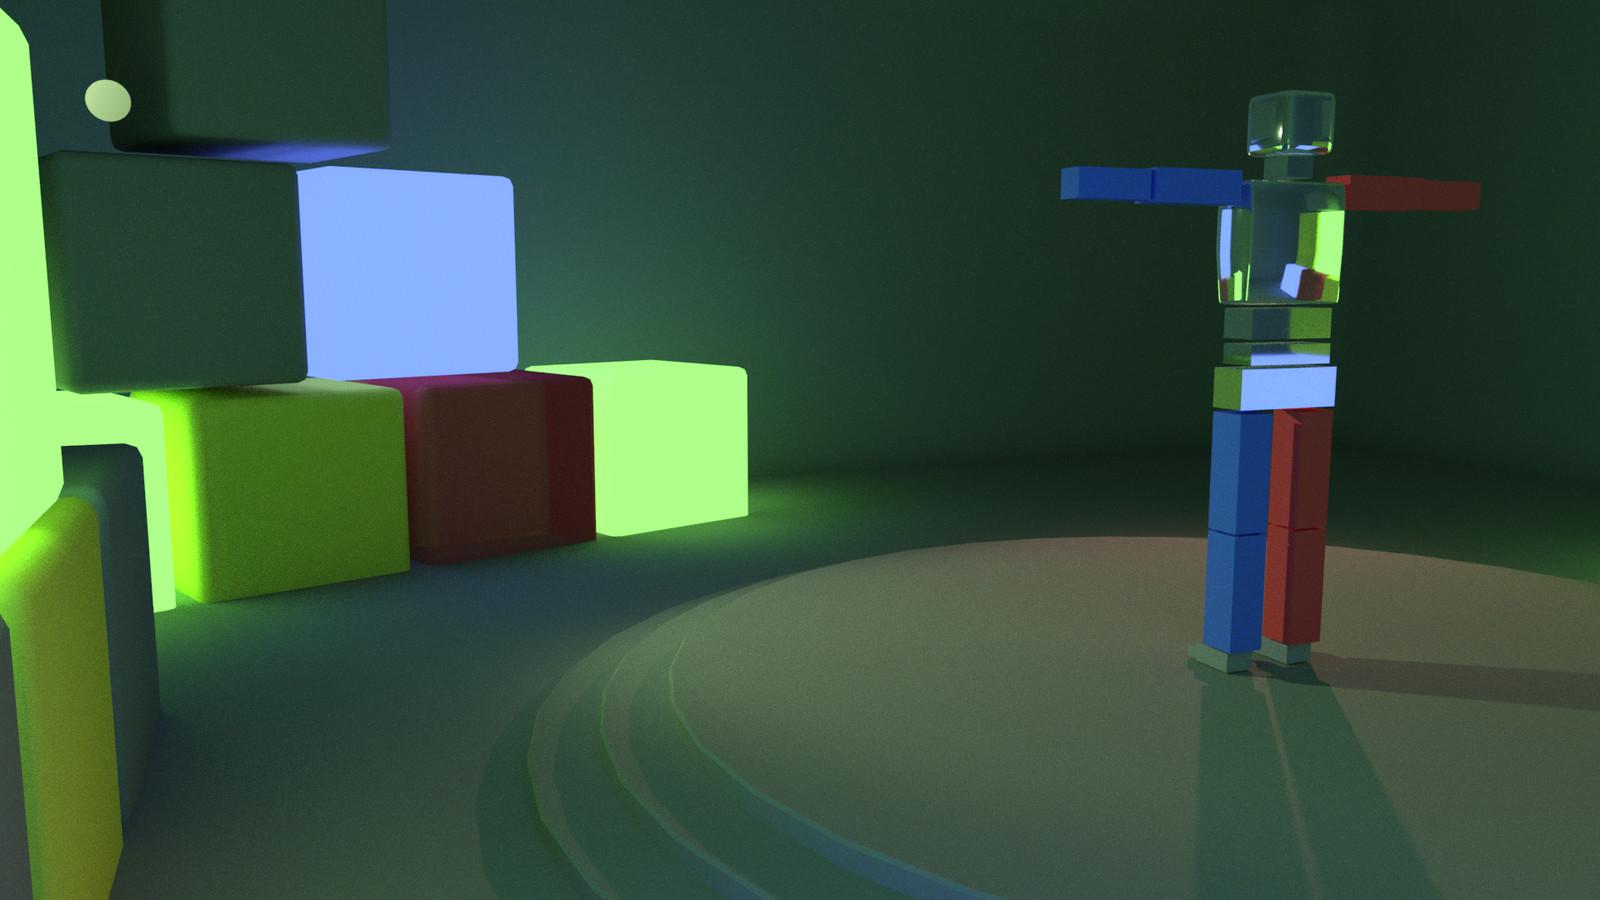 Alternate still - lights are behaving strangely